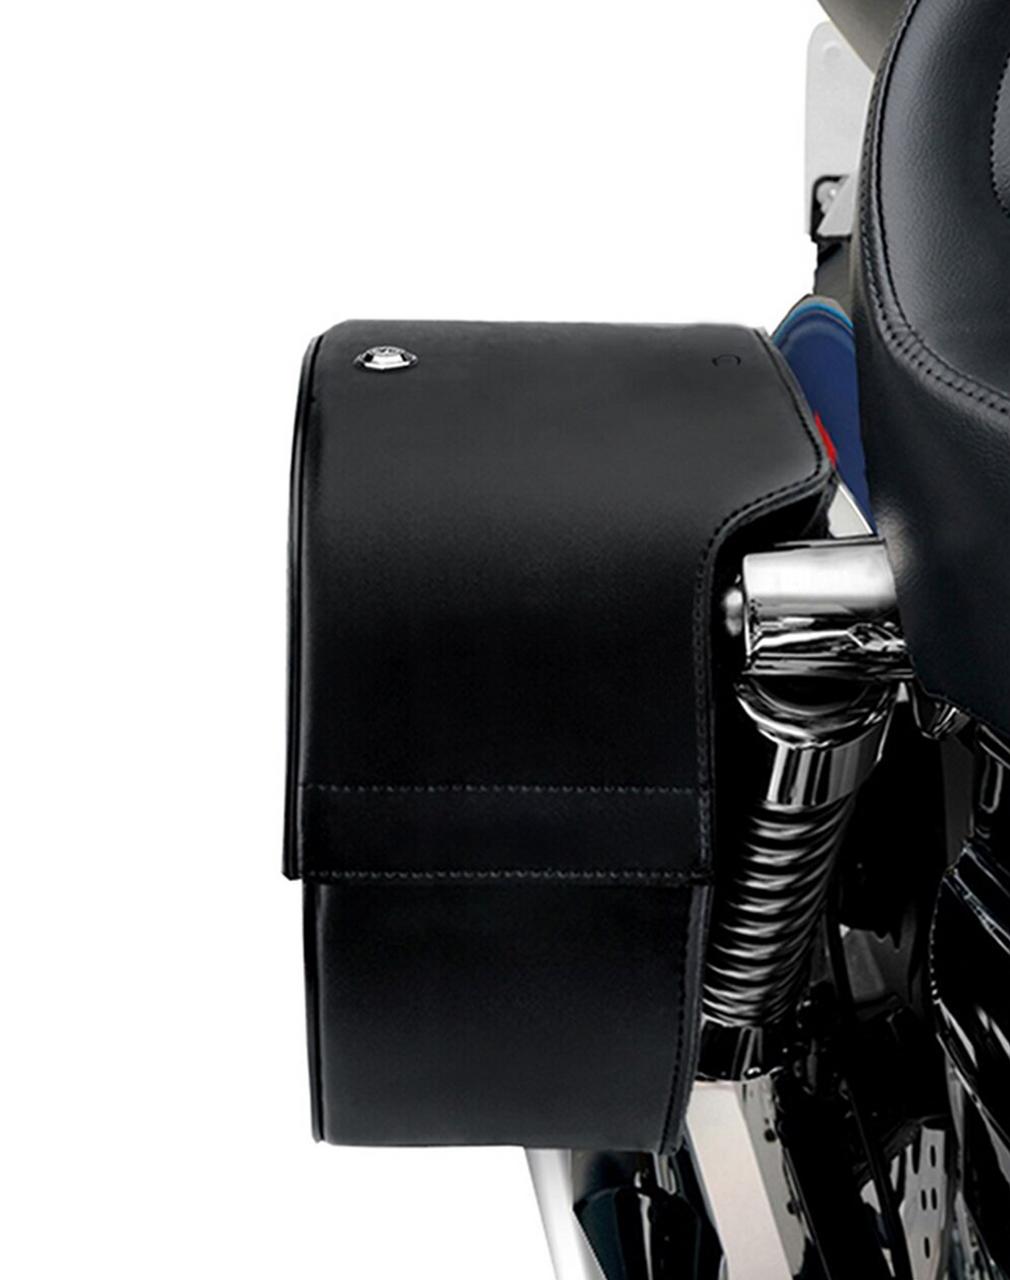 Viking Shock Cutout Slanted Studded Large Motorcycle Saddlebags For Harley Dyna Switchback Shock Cutout View